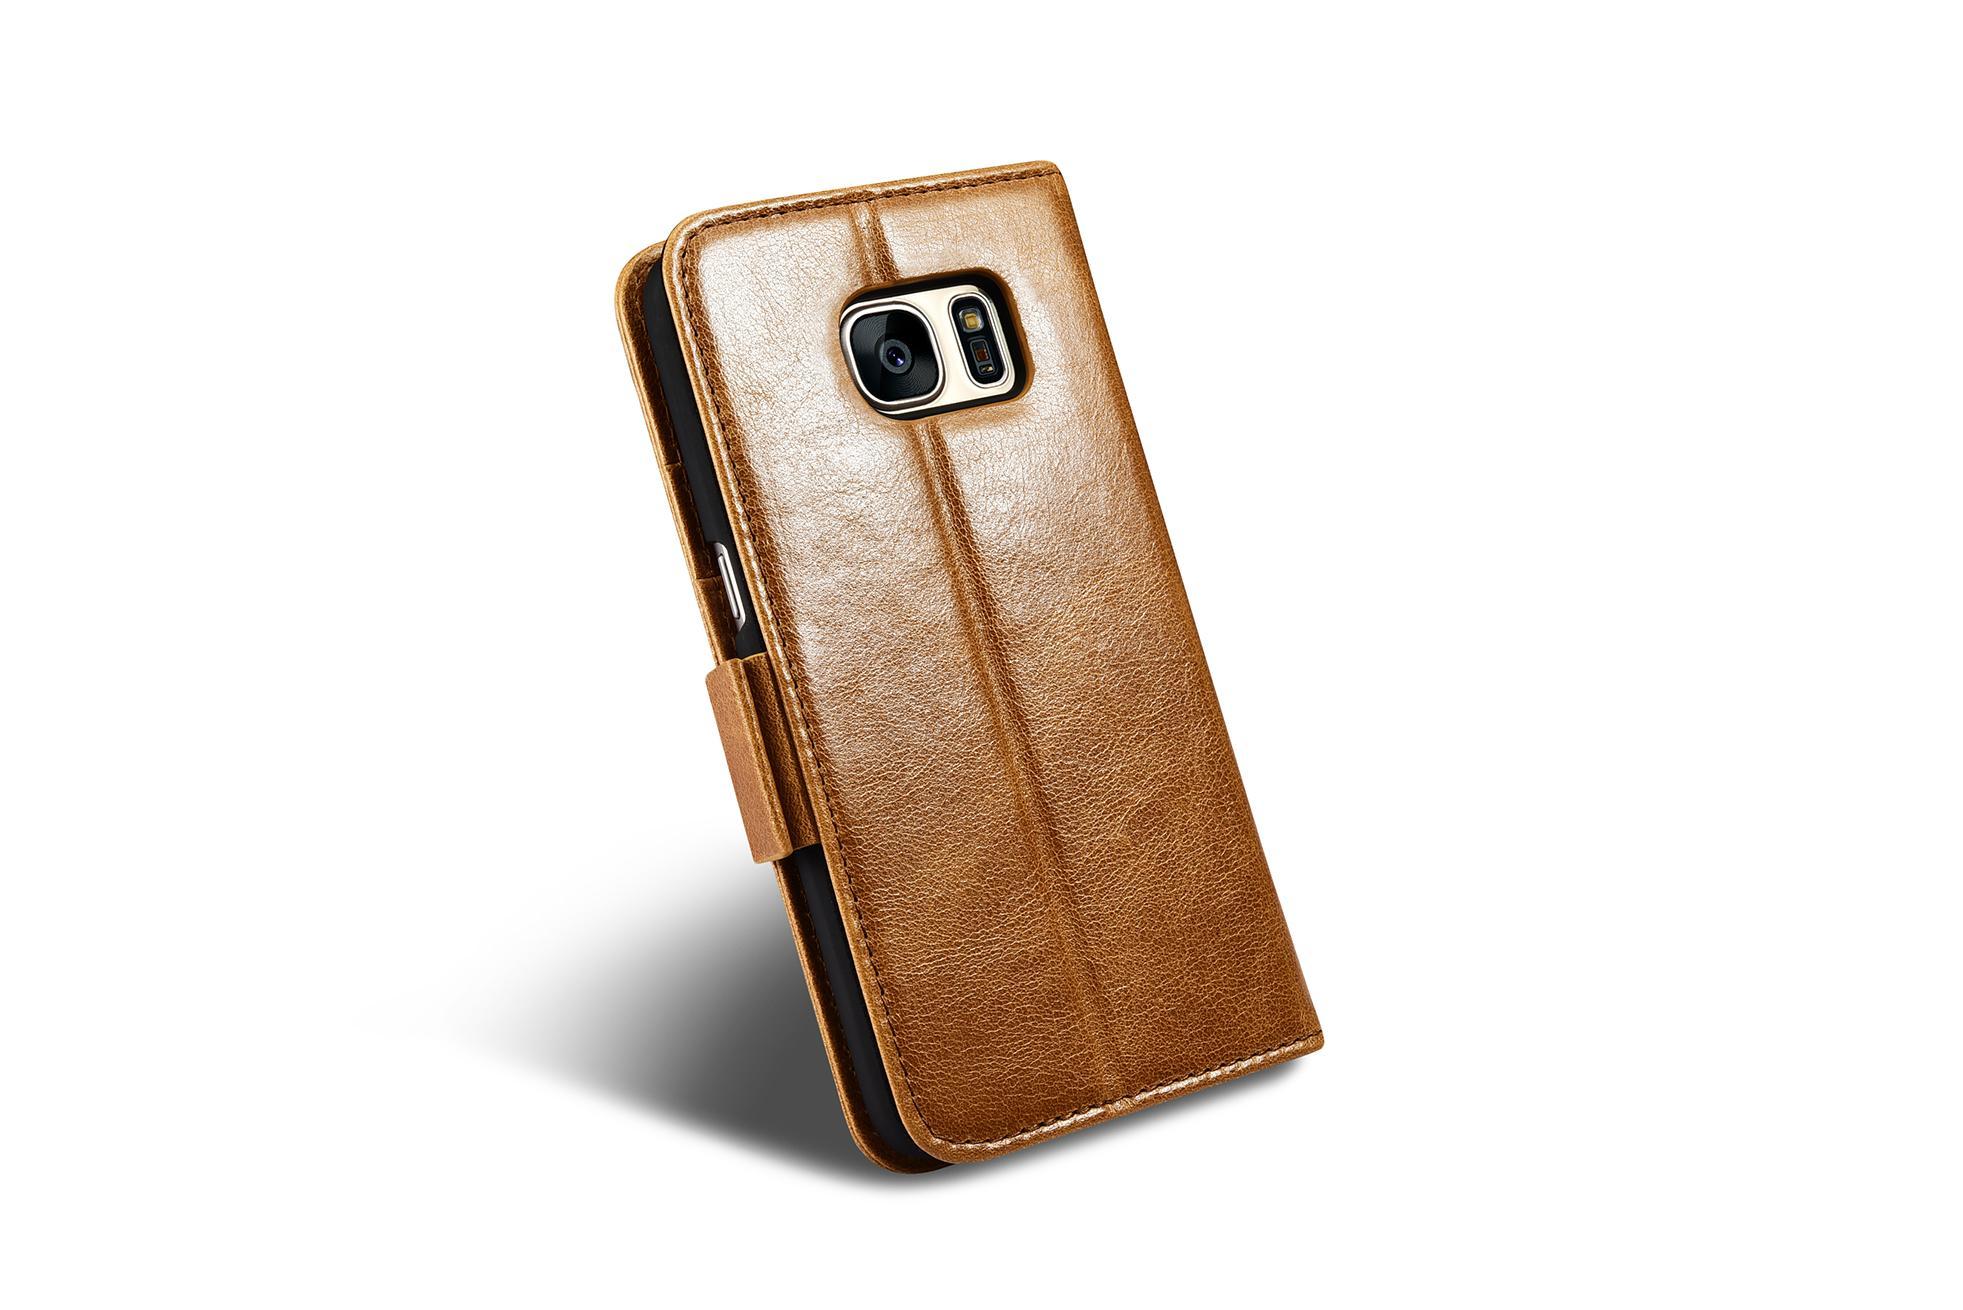 iCarer Samsung Galaxy S7 Silmarillion Leather Detachable 2in1 Wallet Folio Case 12